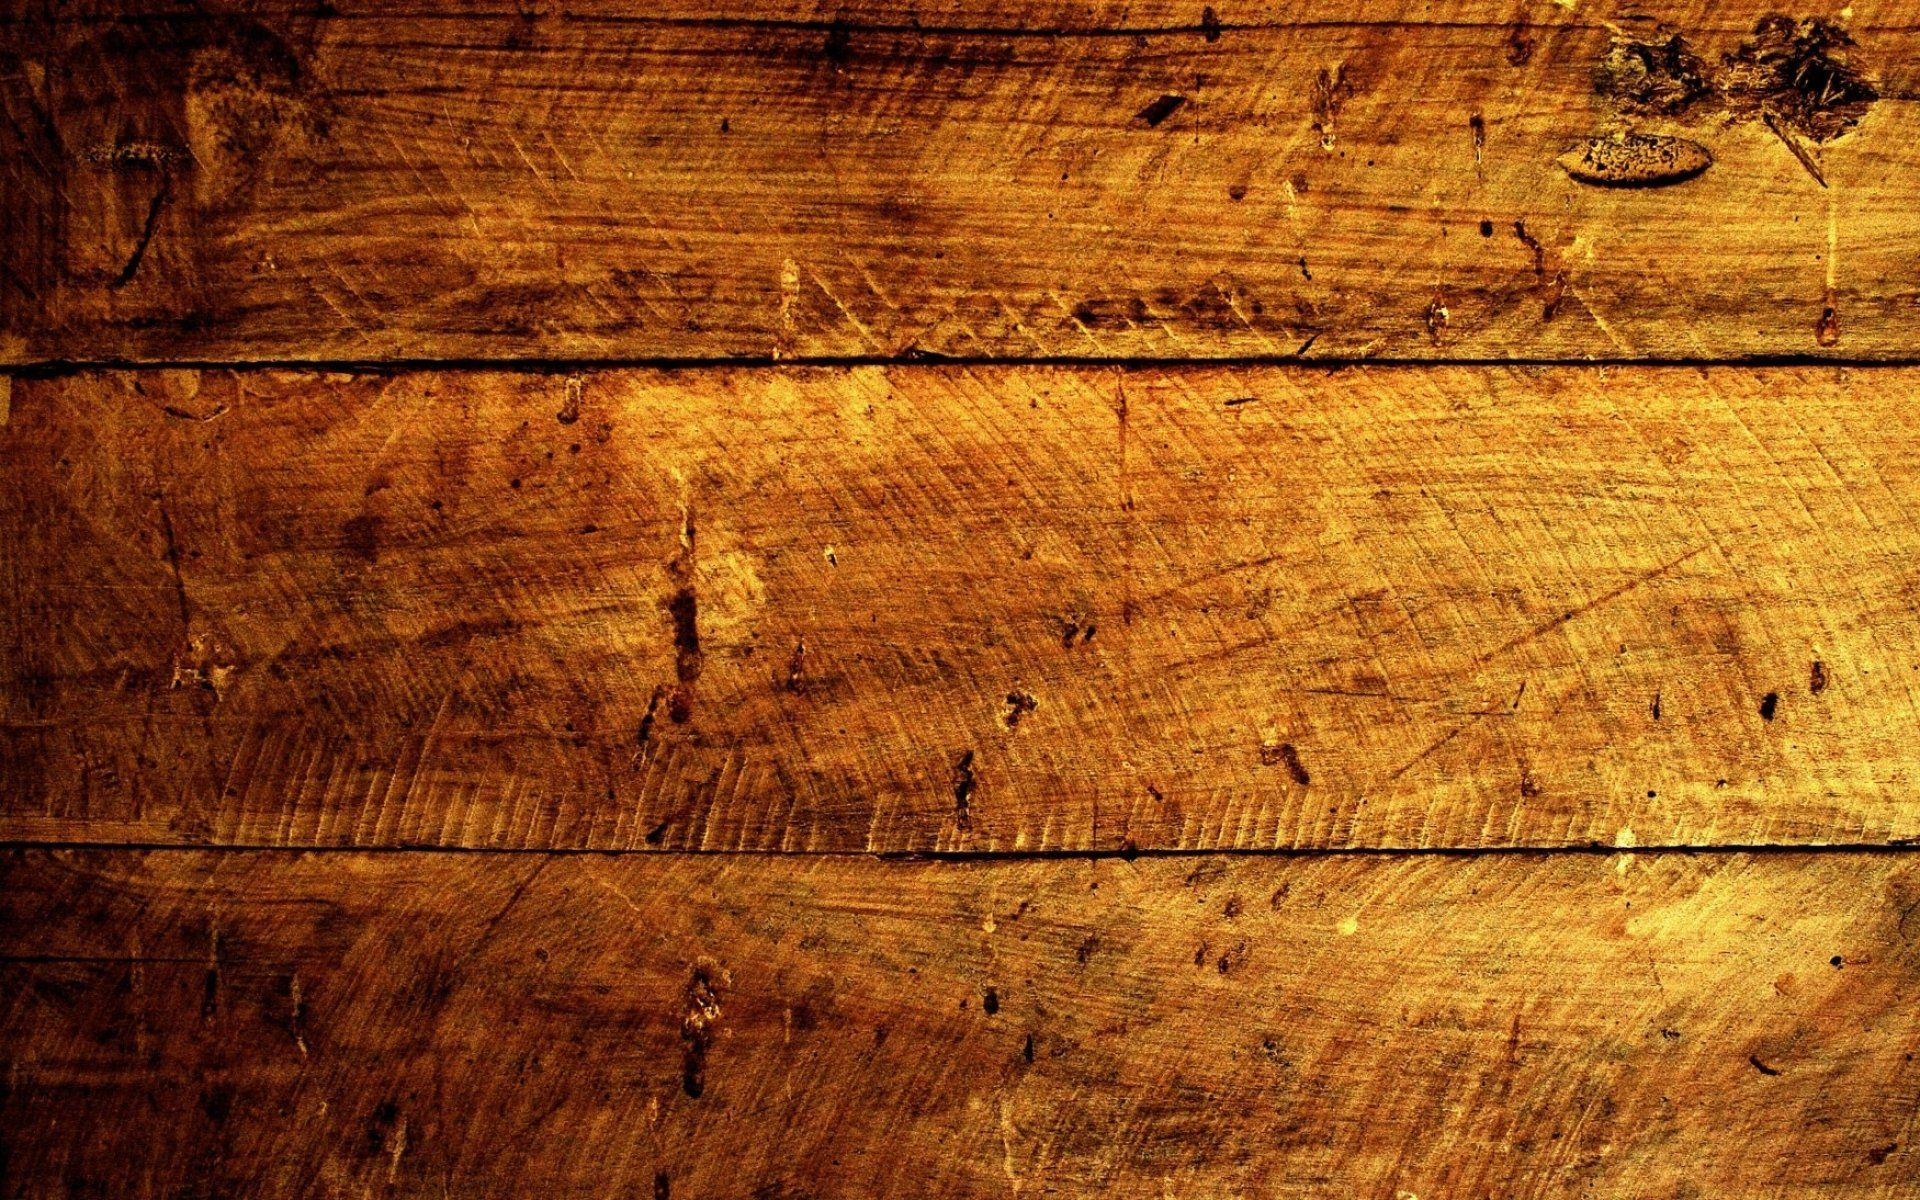 Top Wallpaper High Resolution Wood - 75148dff933541ae6437453b7ca15b95  Collection_553770.jpg